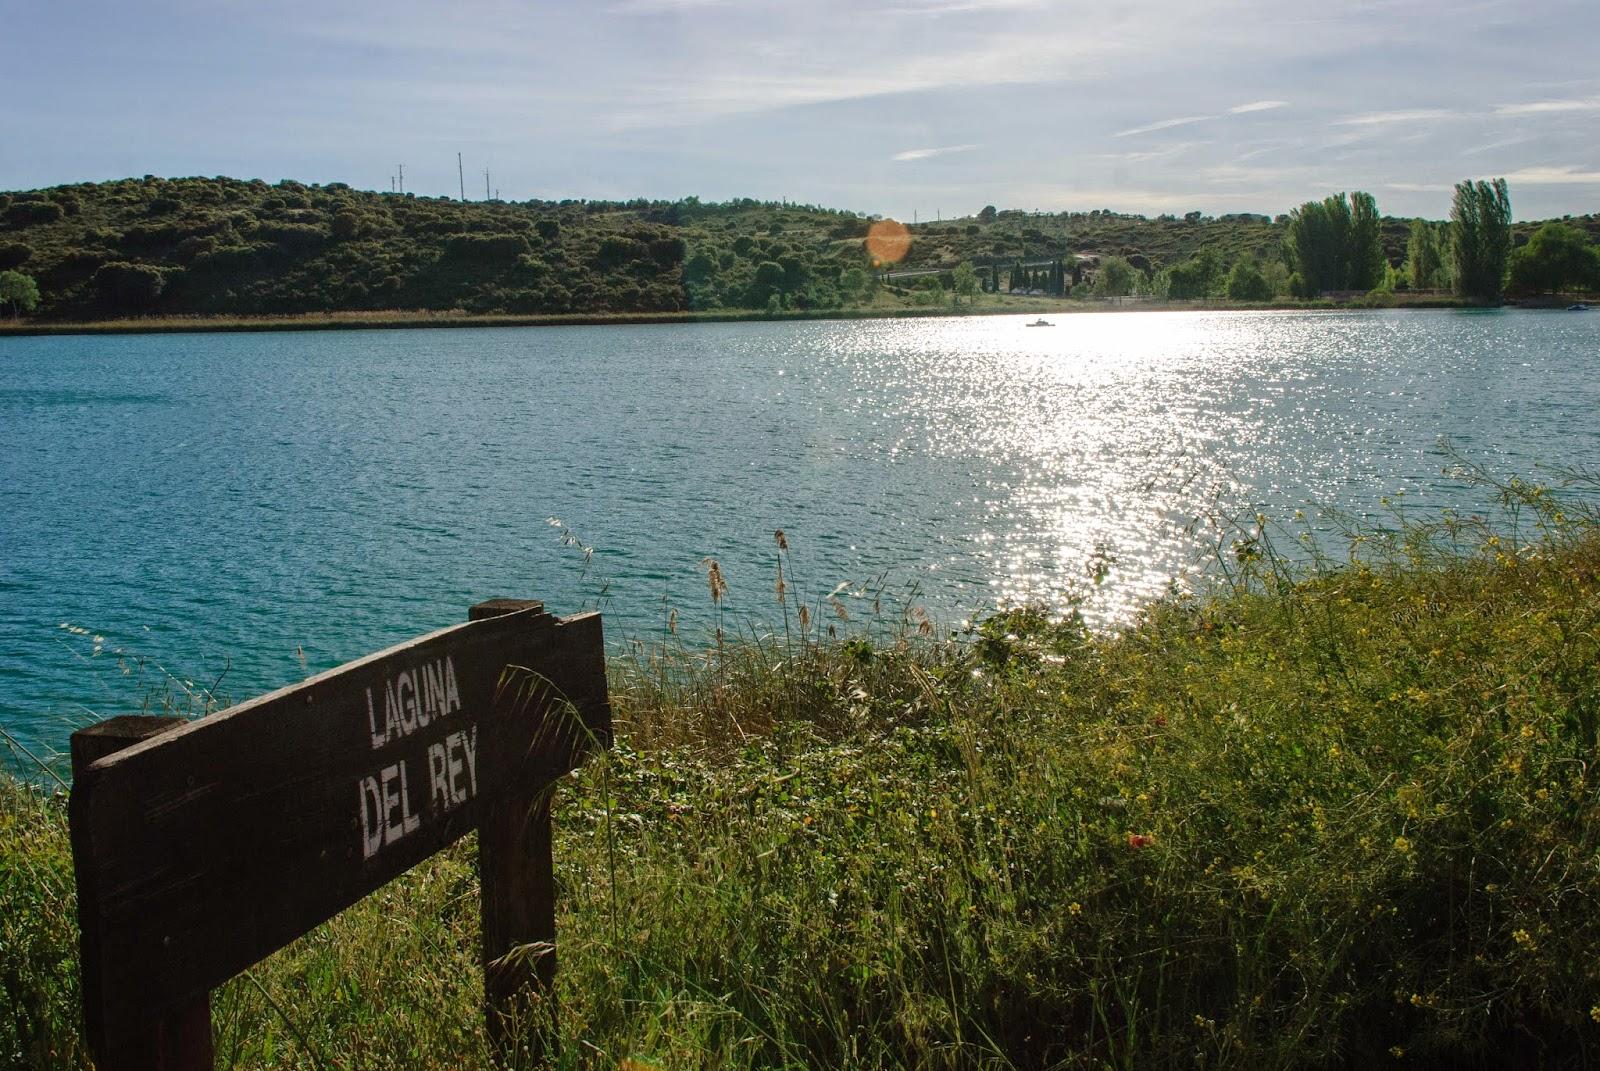 Laguna del Rey, Lagunas de Ruidera